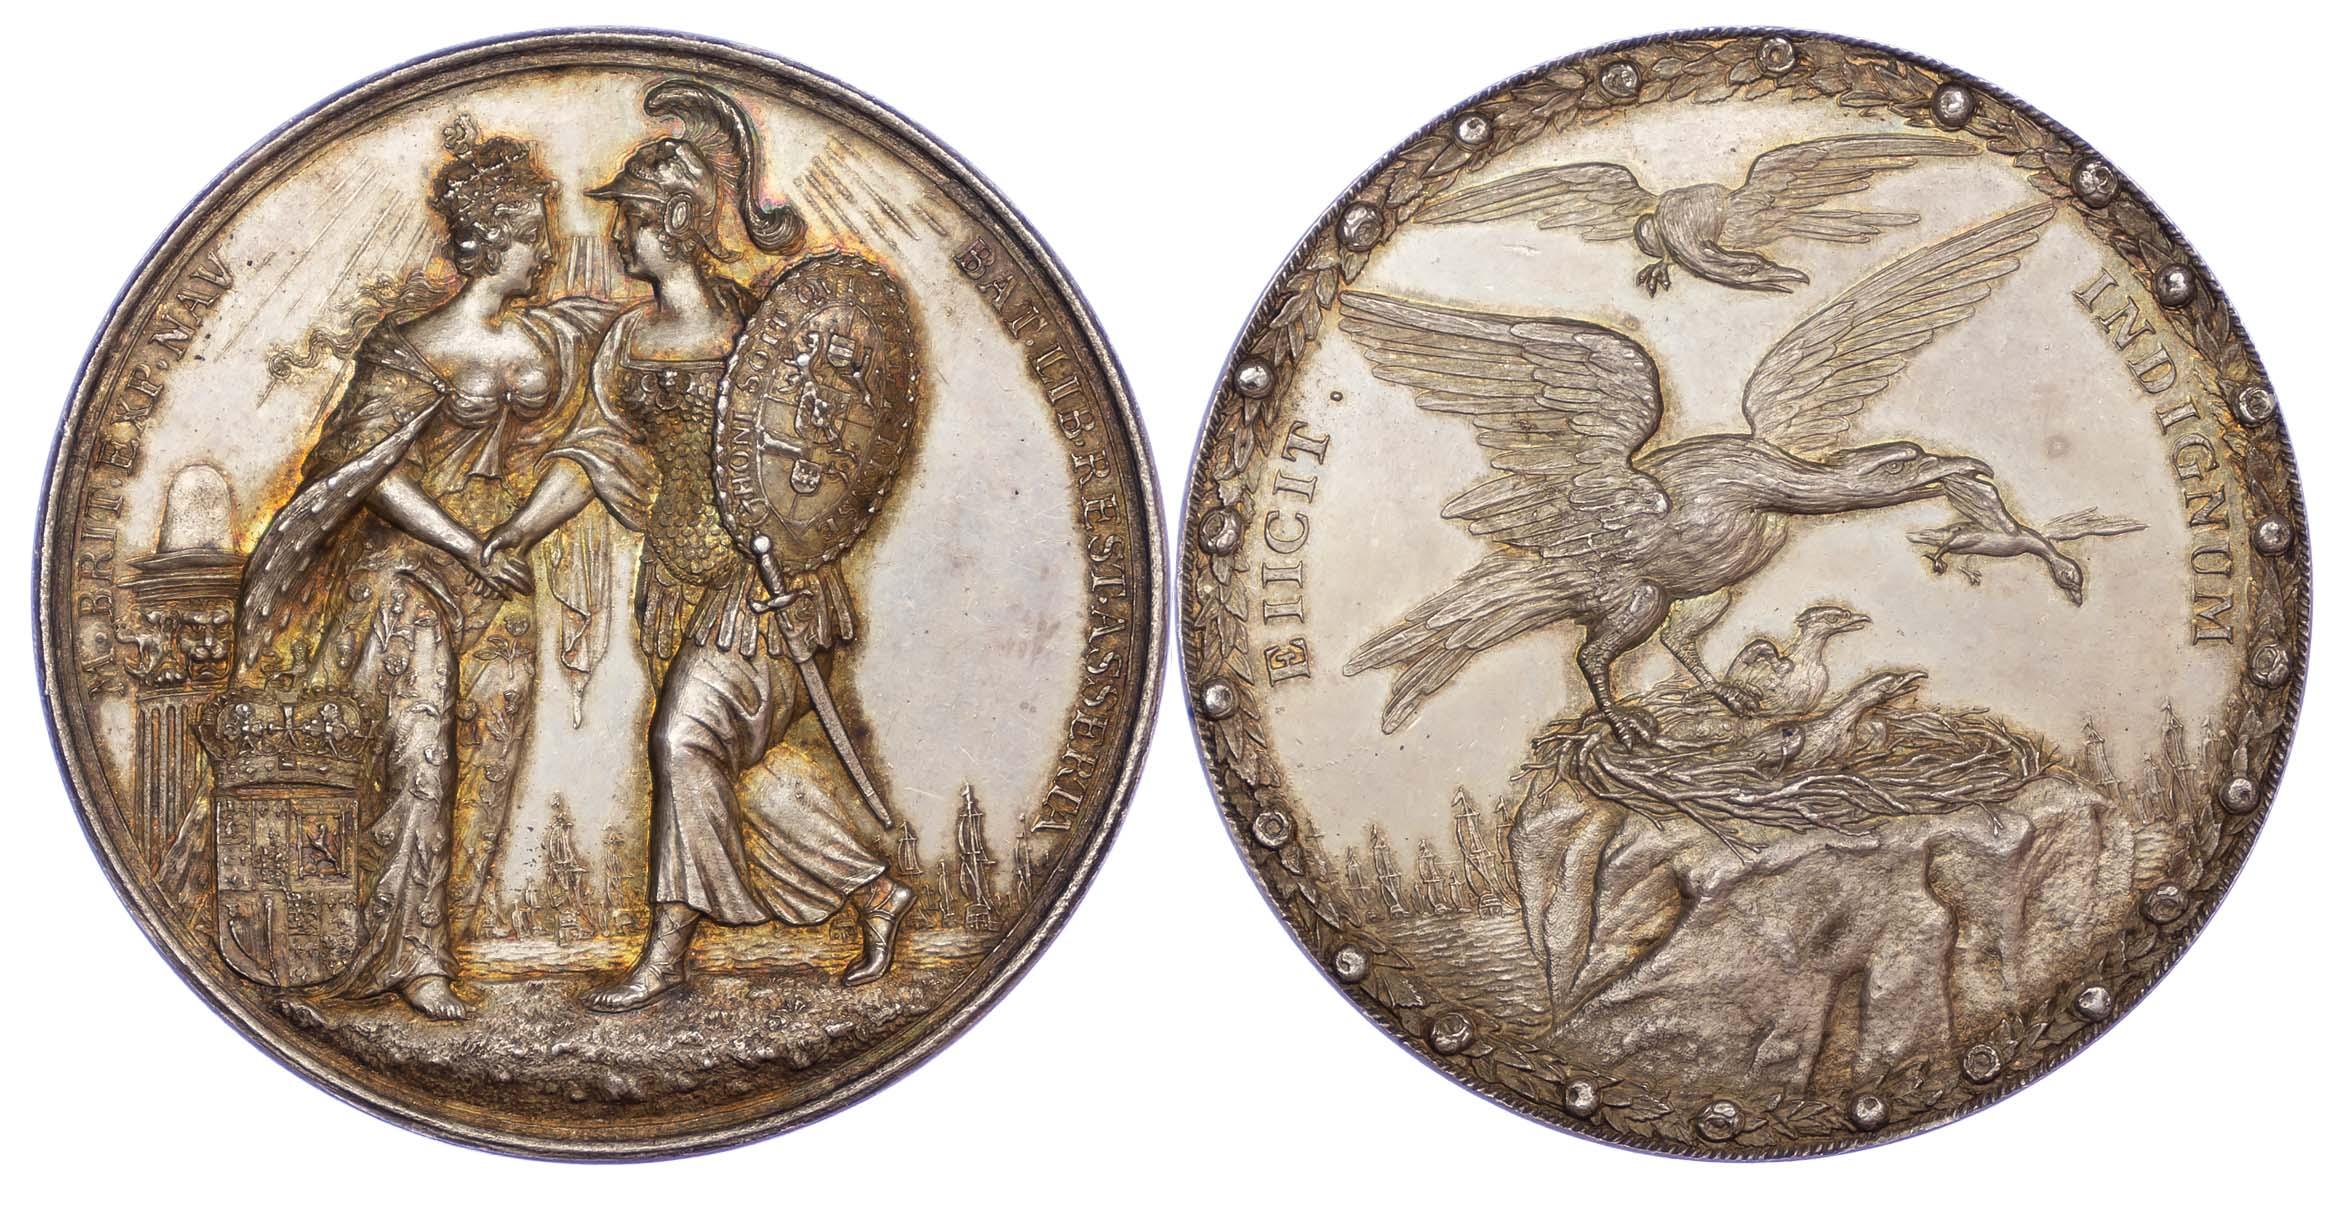 James II, Flight of Prince James, Silver Medal, 1688